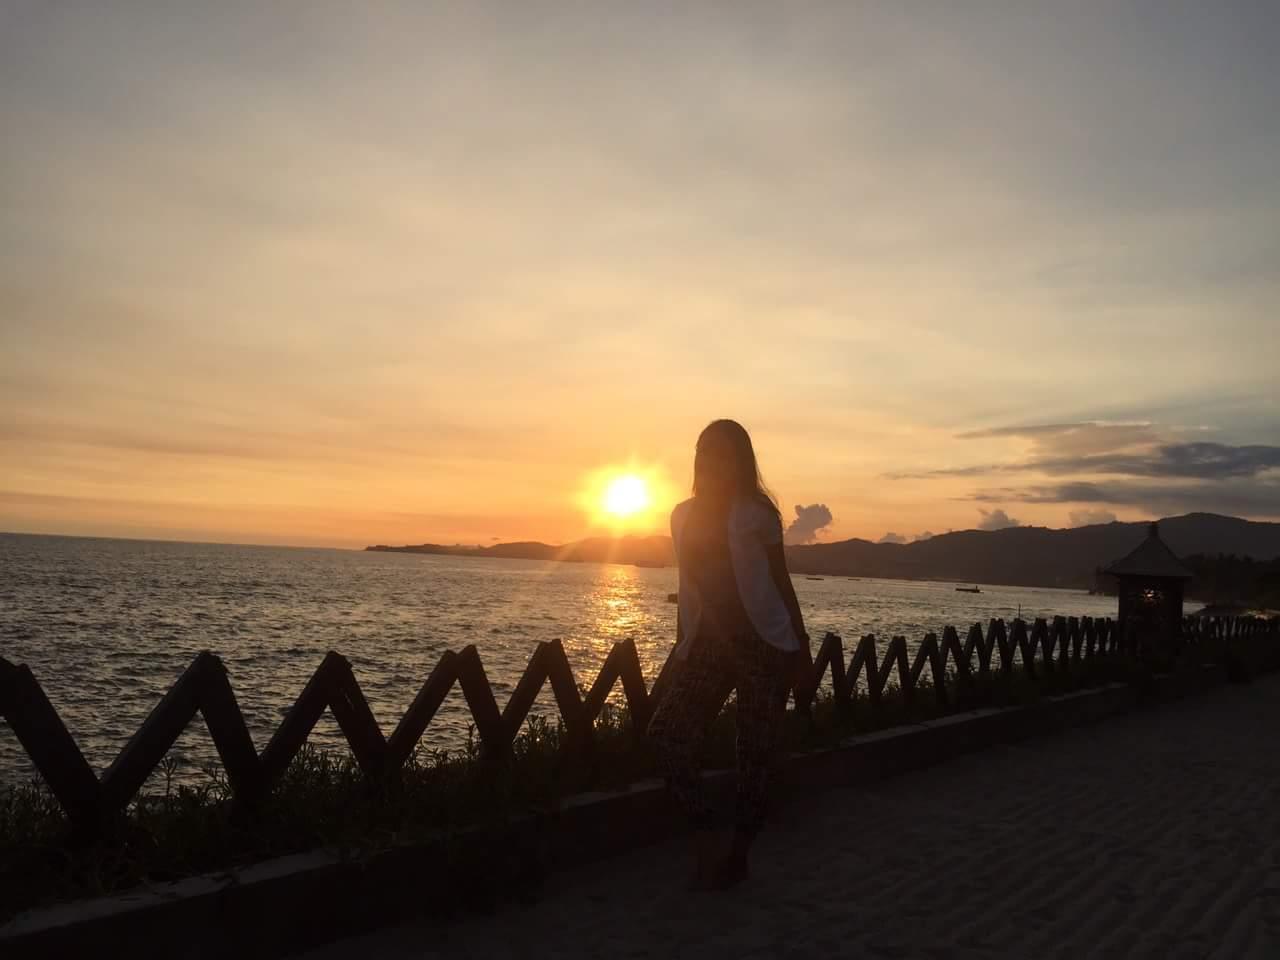 Sunset like a diamond in Bali beach